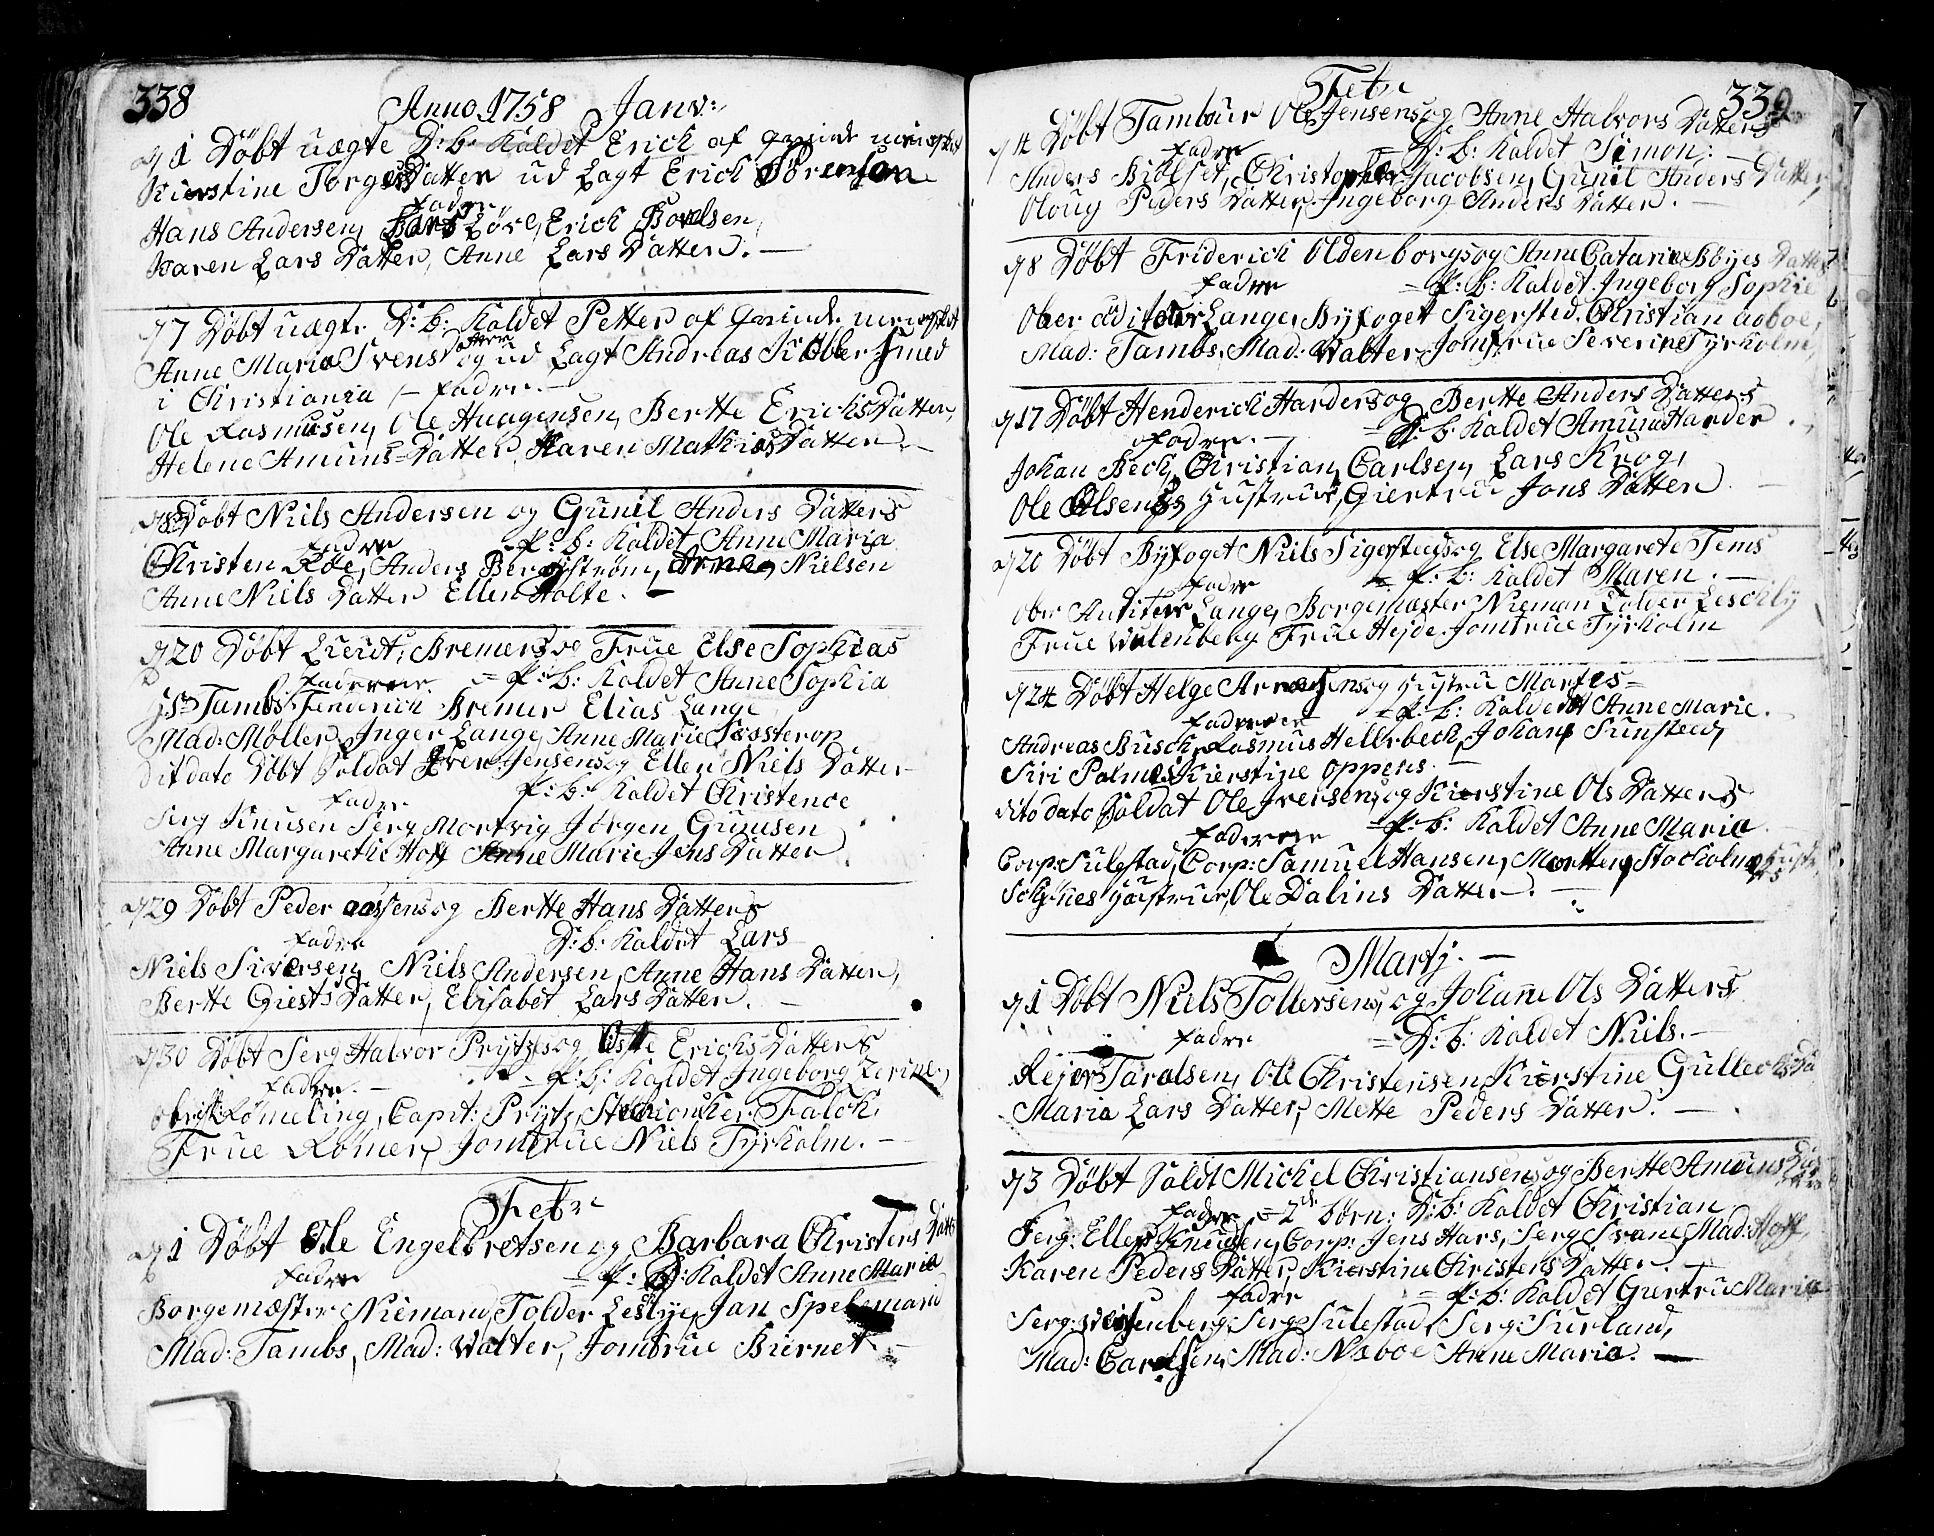 SAO, Fredrikstad prestekontor Kirkebøker, F/Fa/L0002: Ministerialbok nr. 2, 1750-1804, s. 338-339